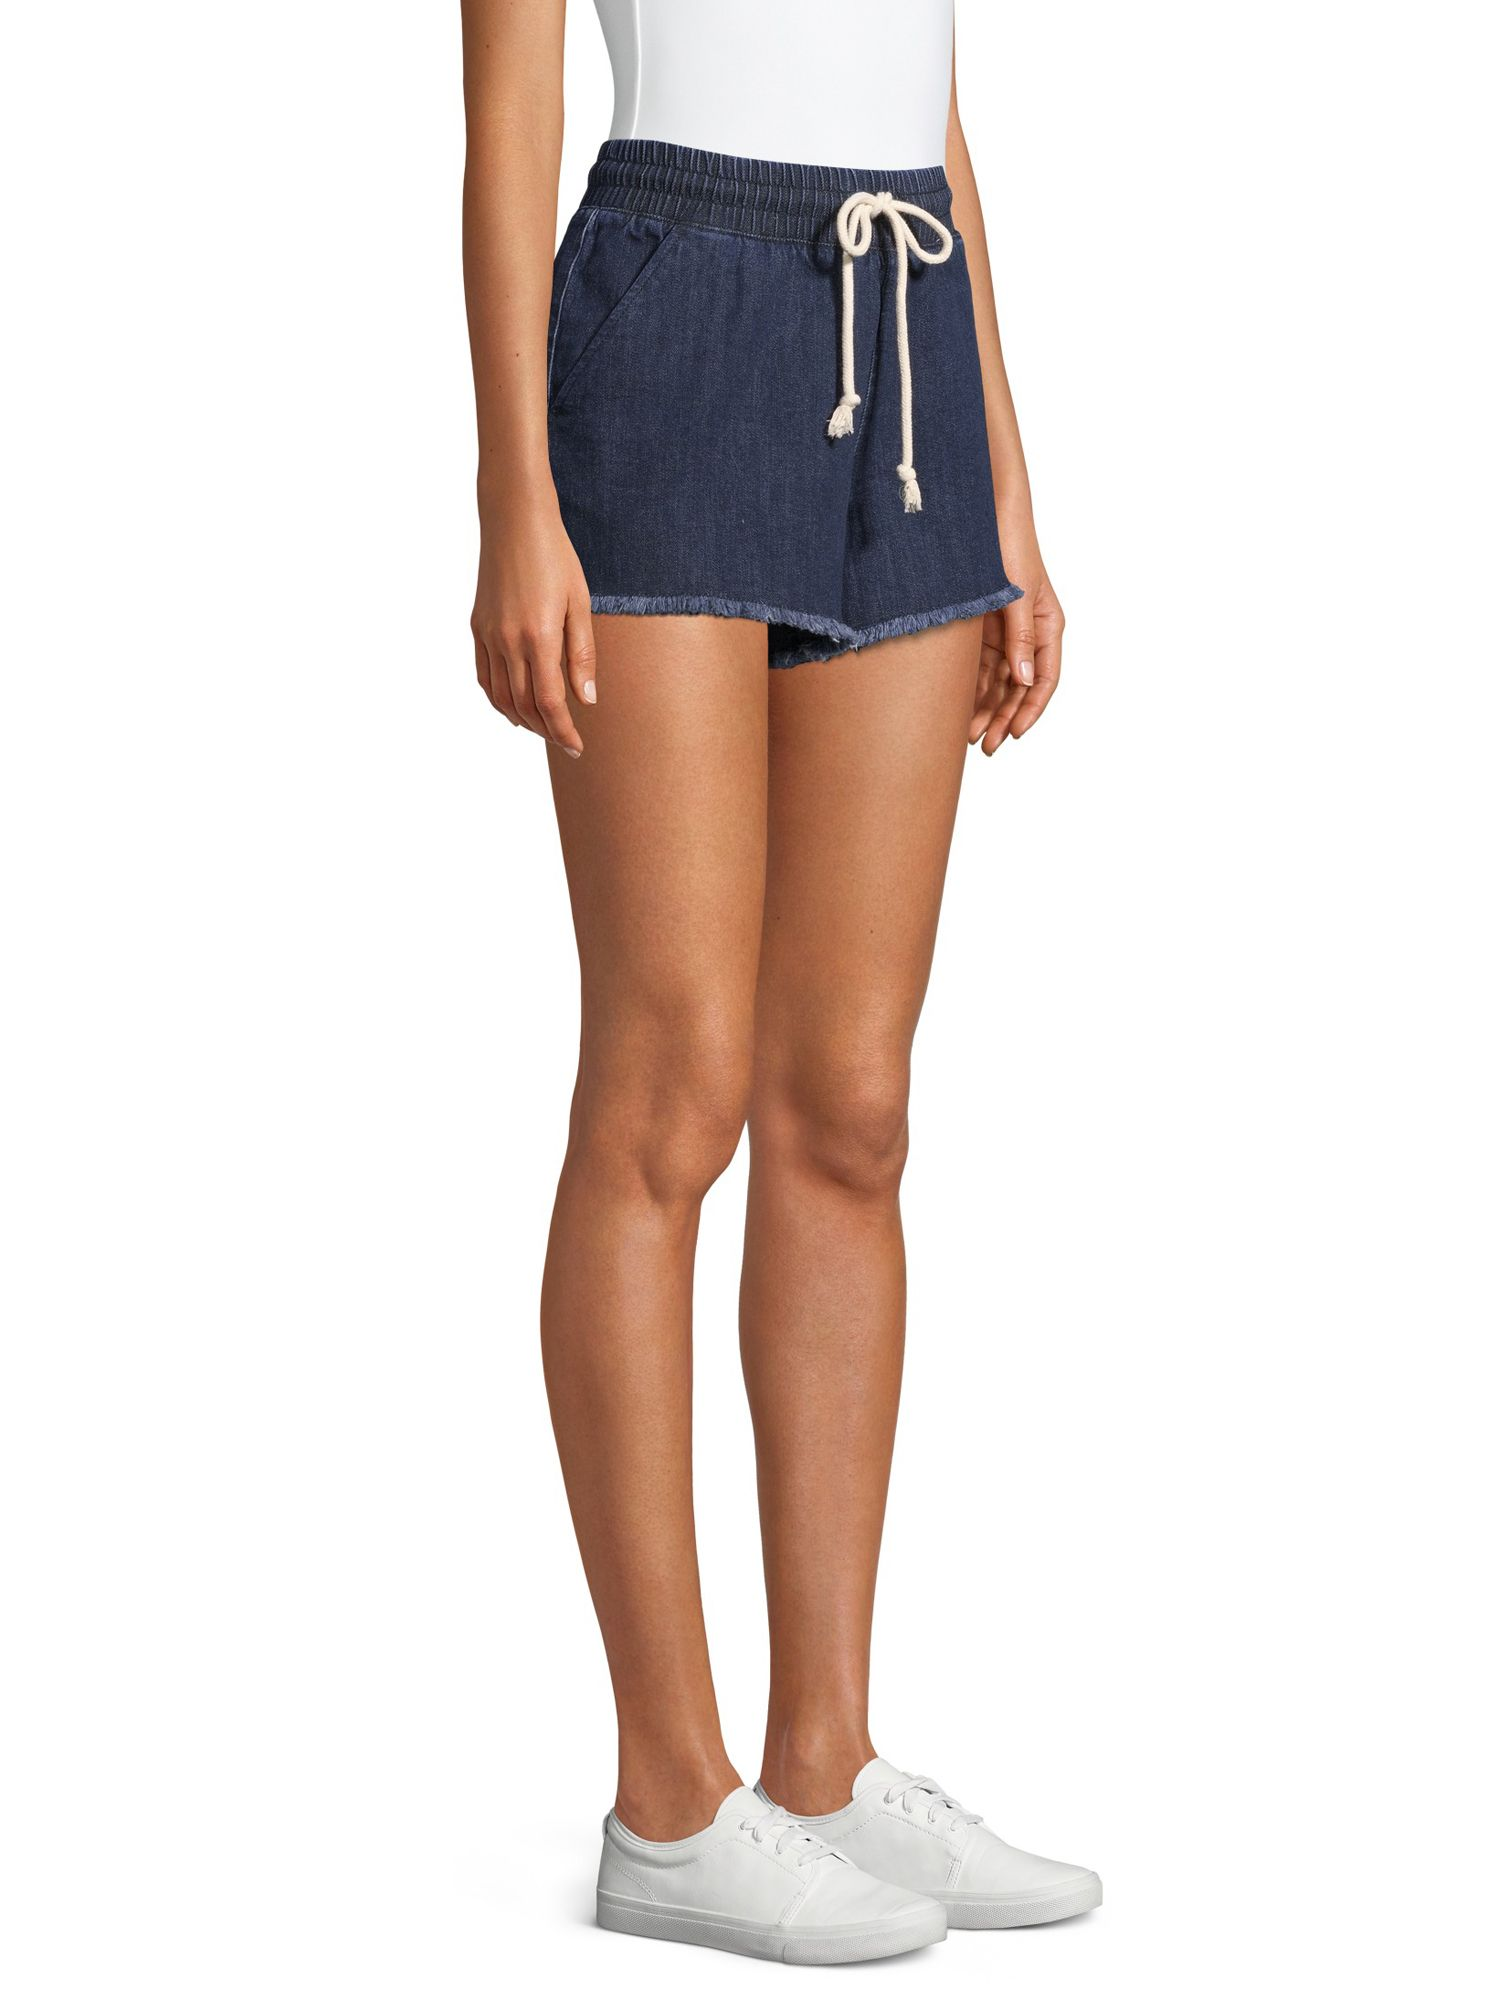 No Boundaries No Boundaries Tie Front Shorts Walmart Com Fashion Shorts How To Wear [ 2000 x 1500 Pixel ]